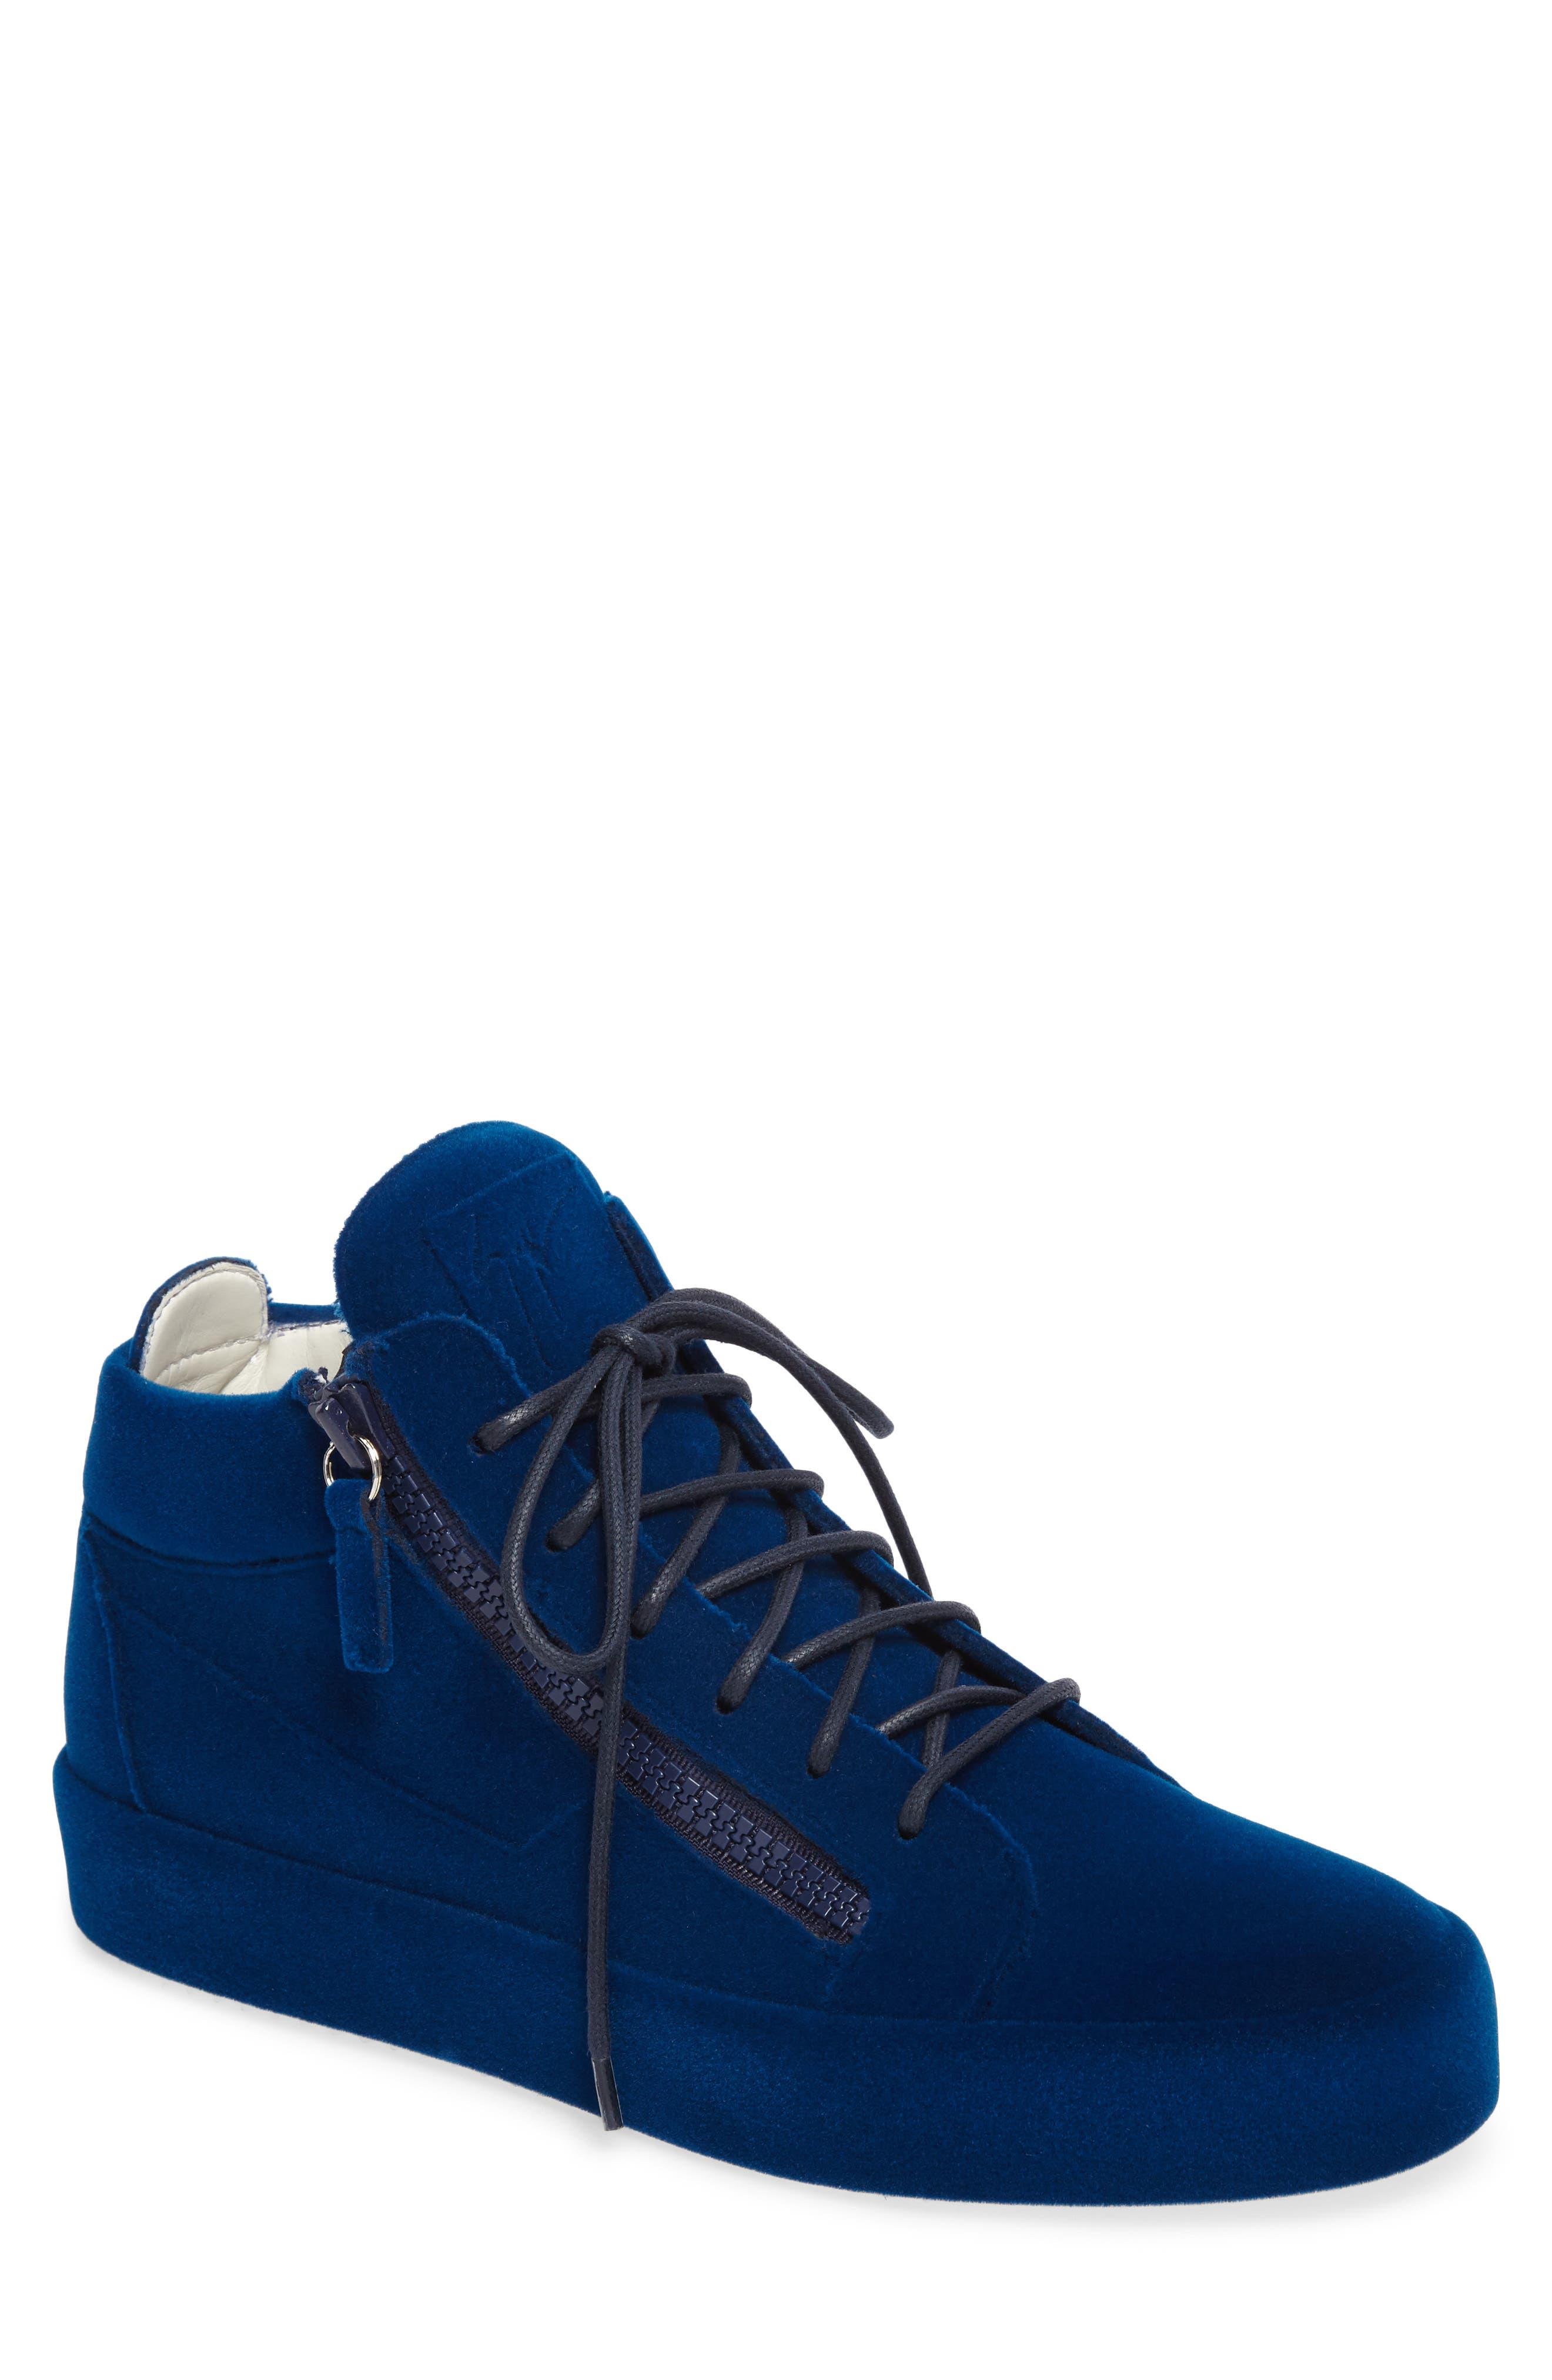 Mid Top Sneaker,                             Main thumbnail 1, color,                             469